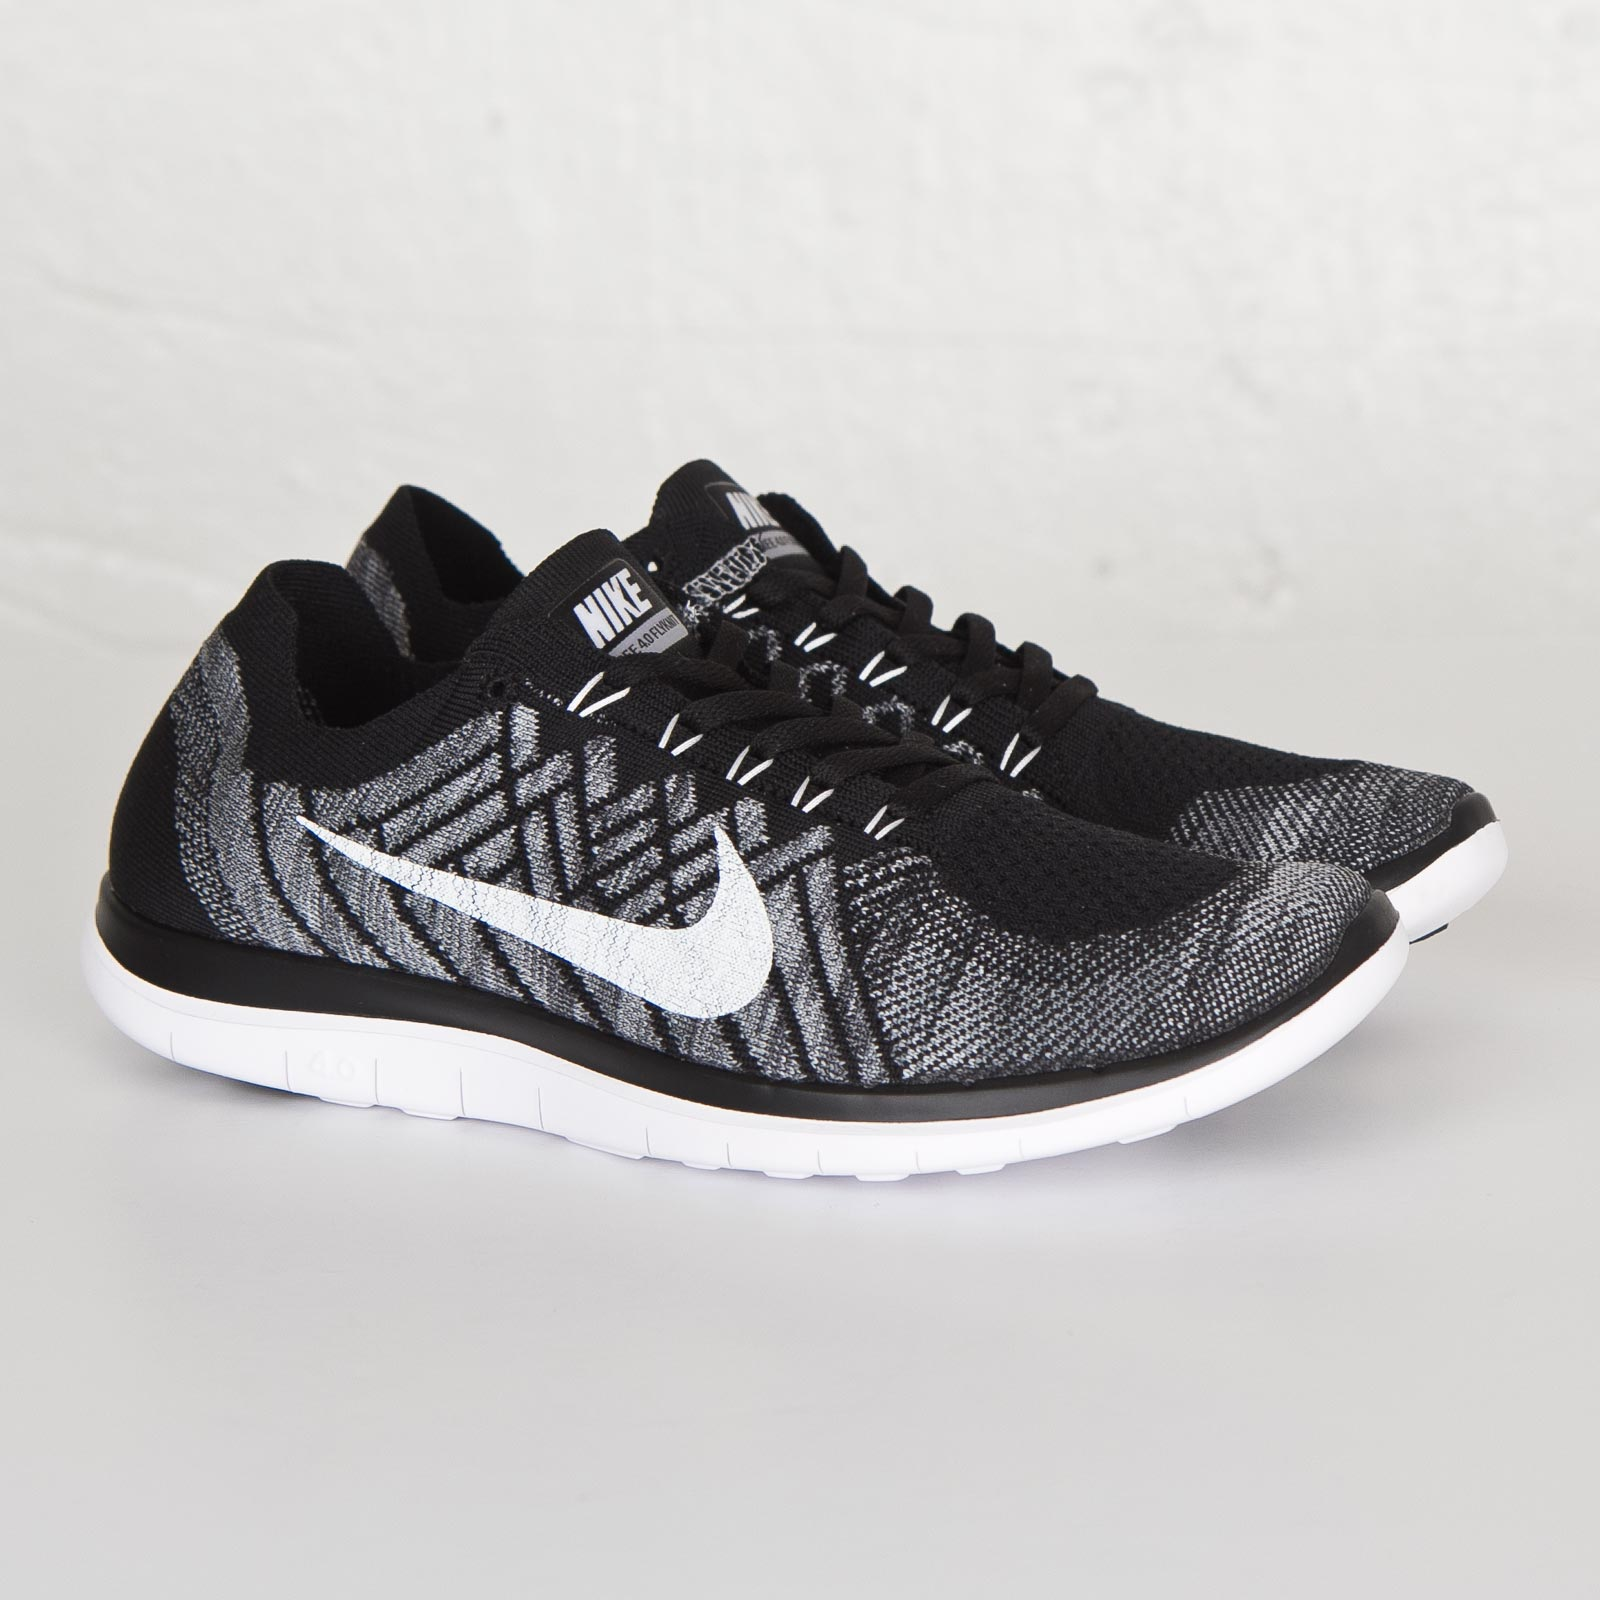 size 40 3af4d 13bd9 Nike Free 4.0 Flyknit